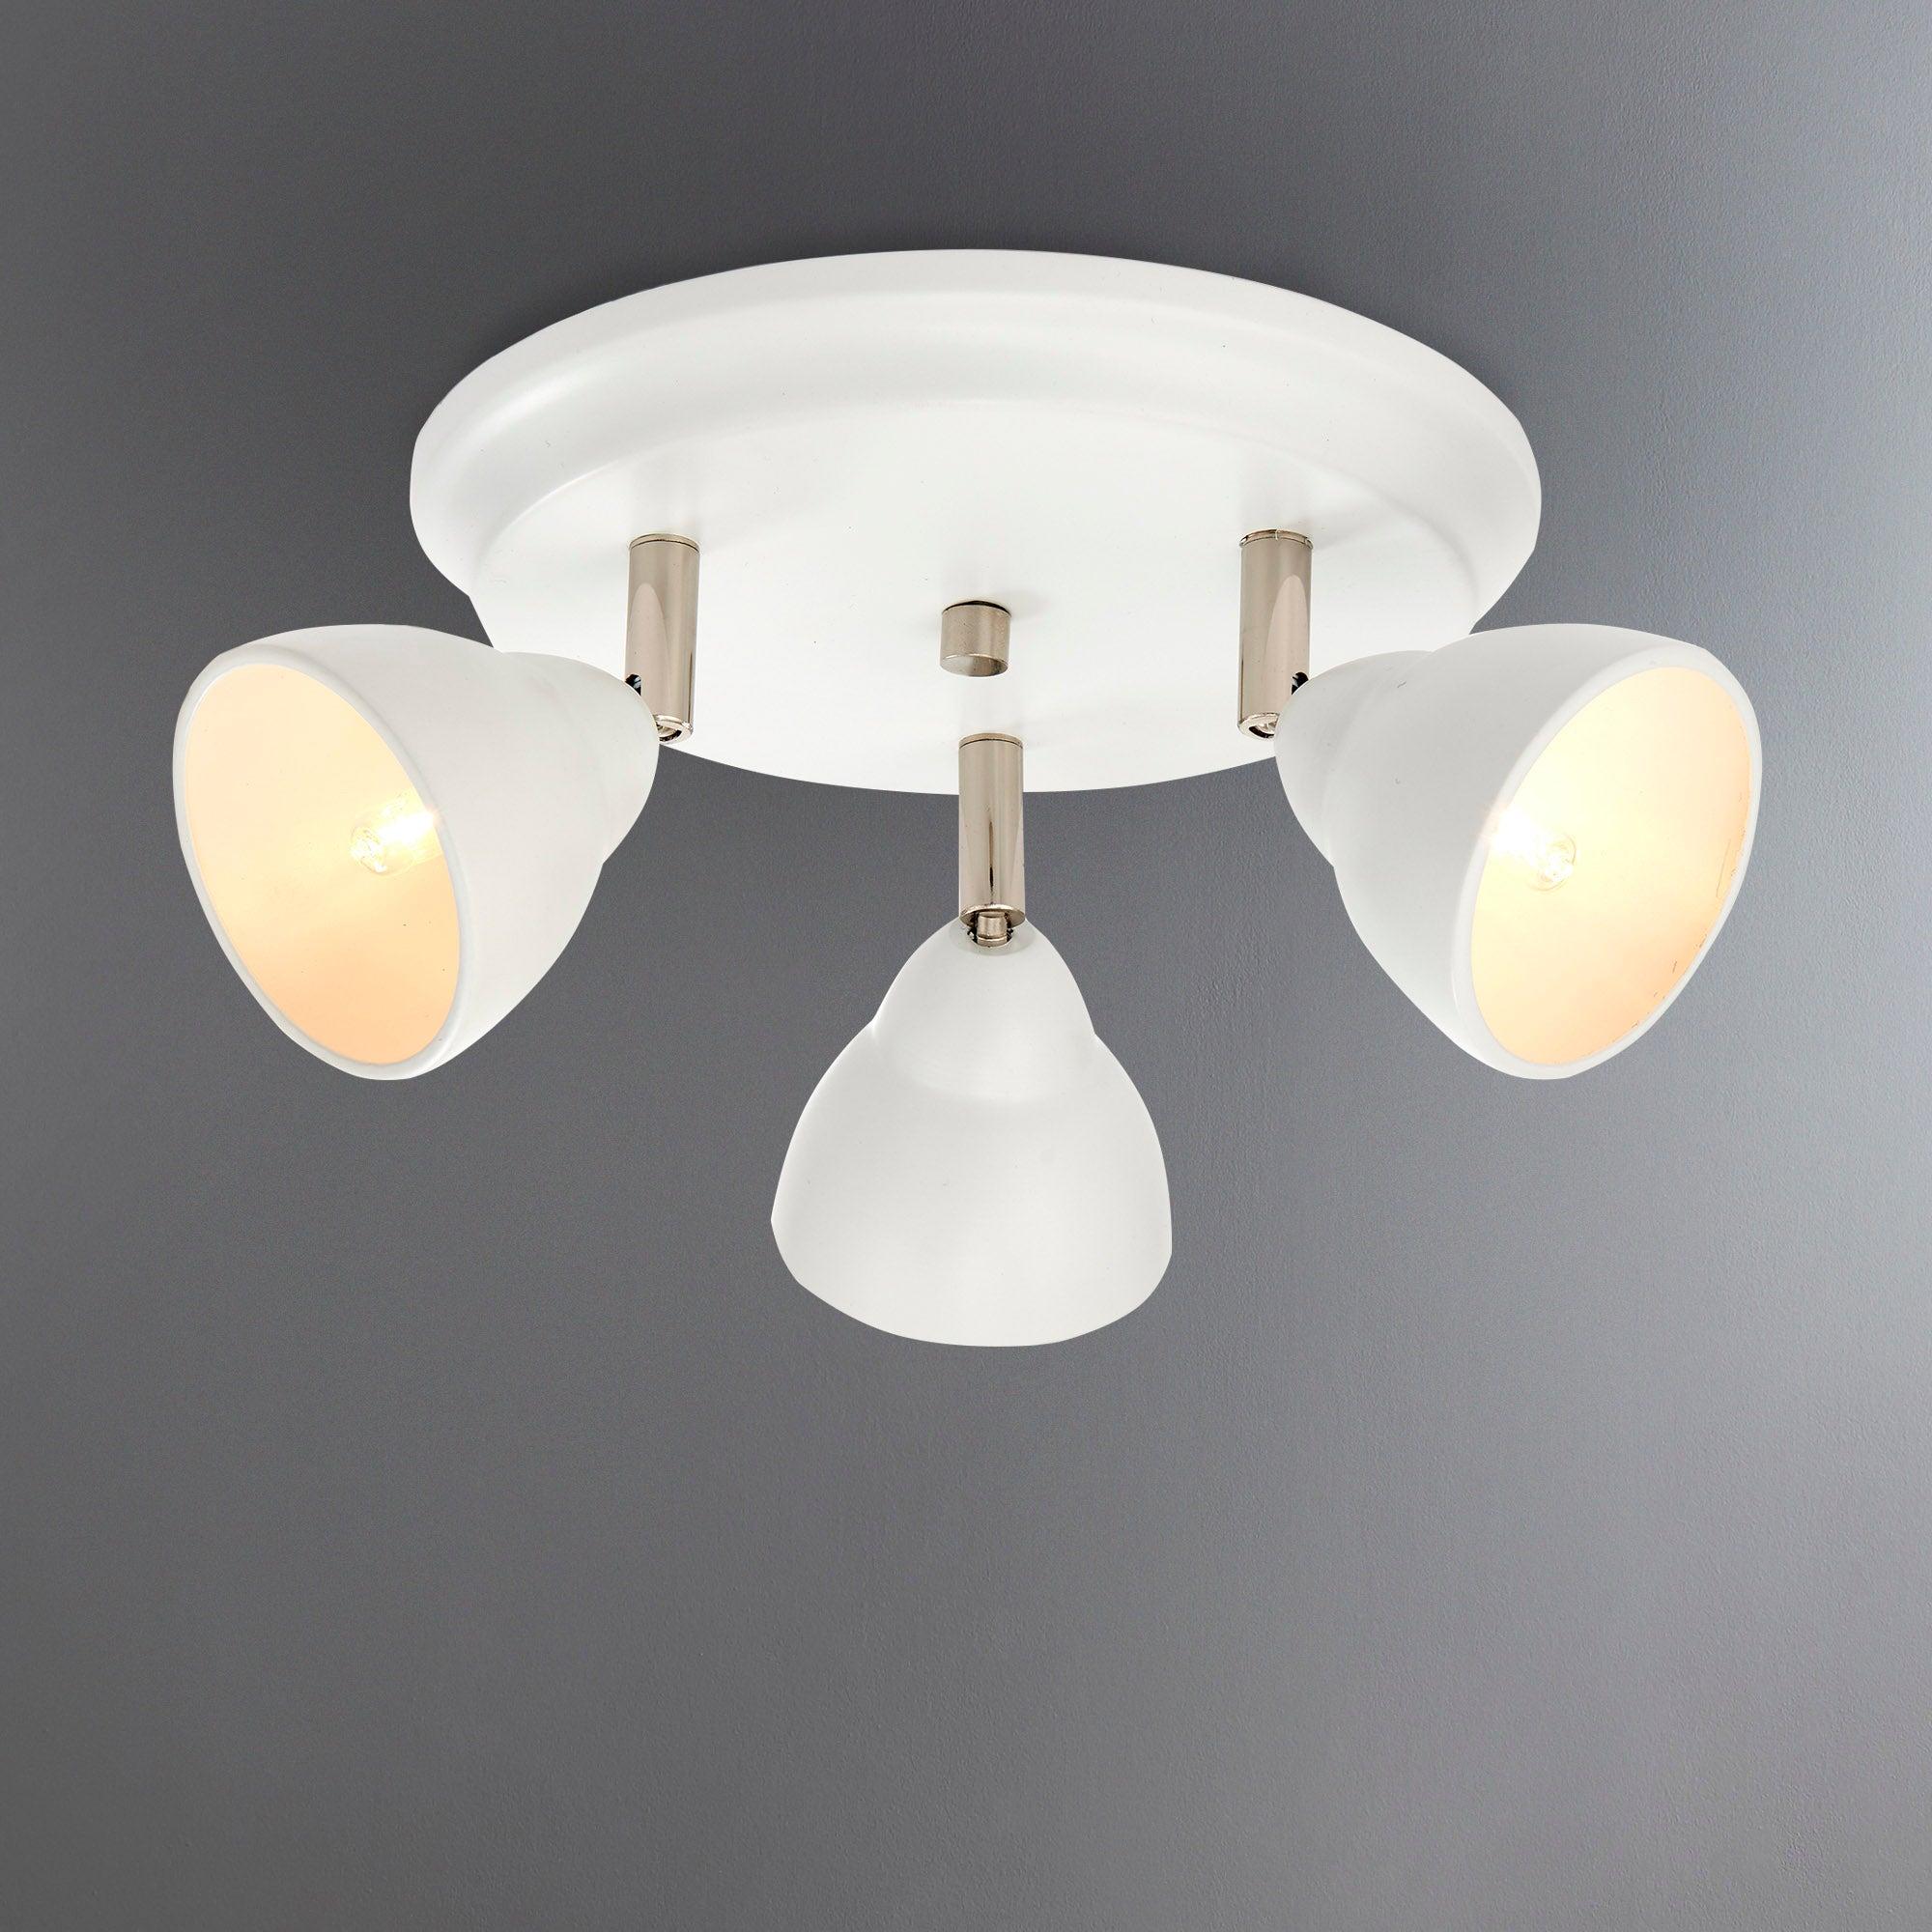 Photo of Moraya matt white 3 light spotlight white